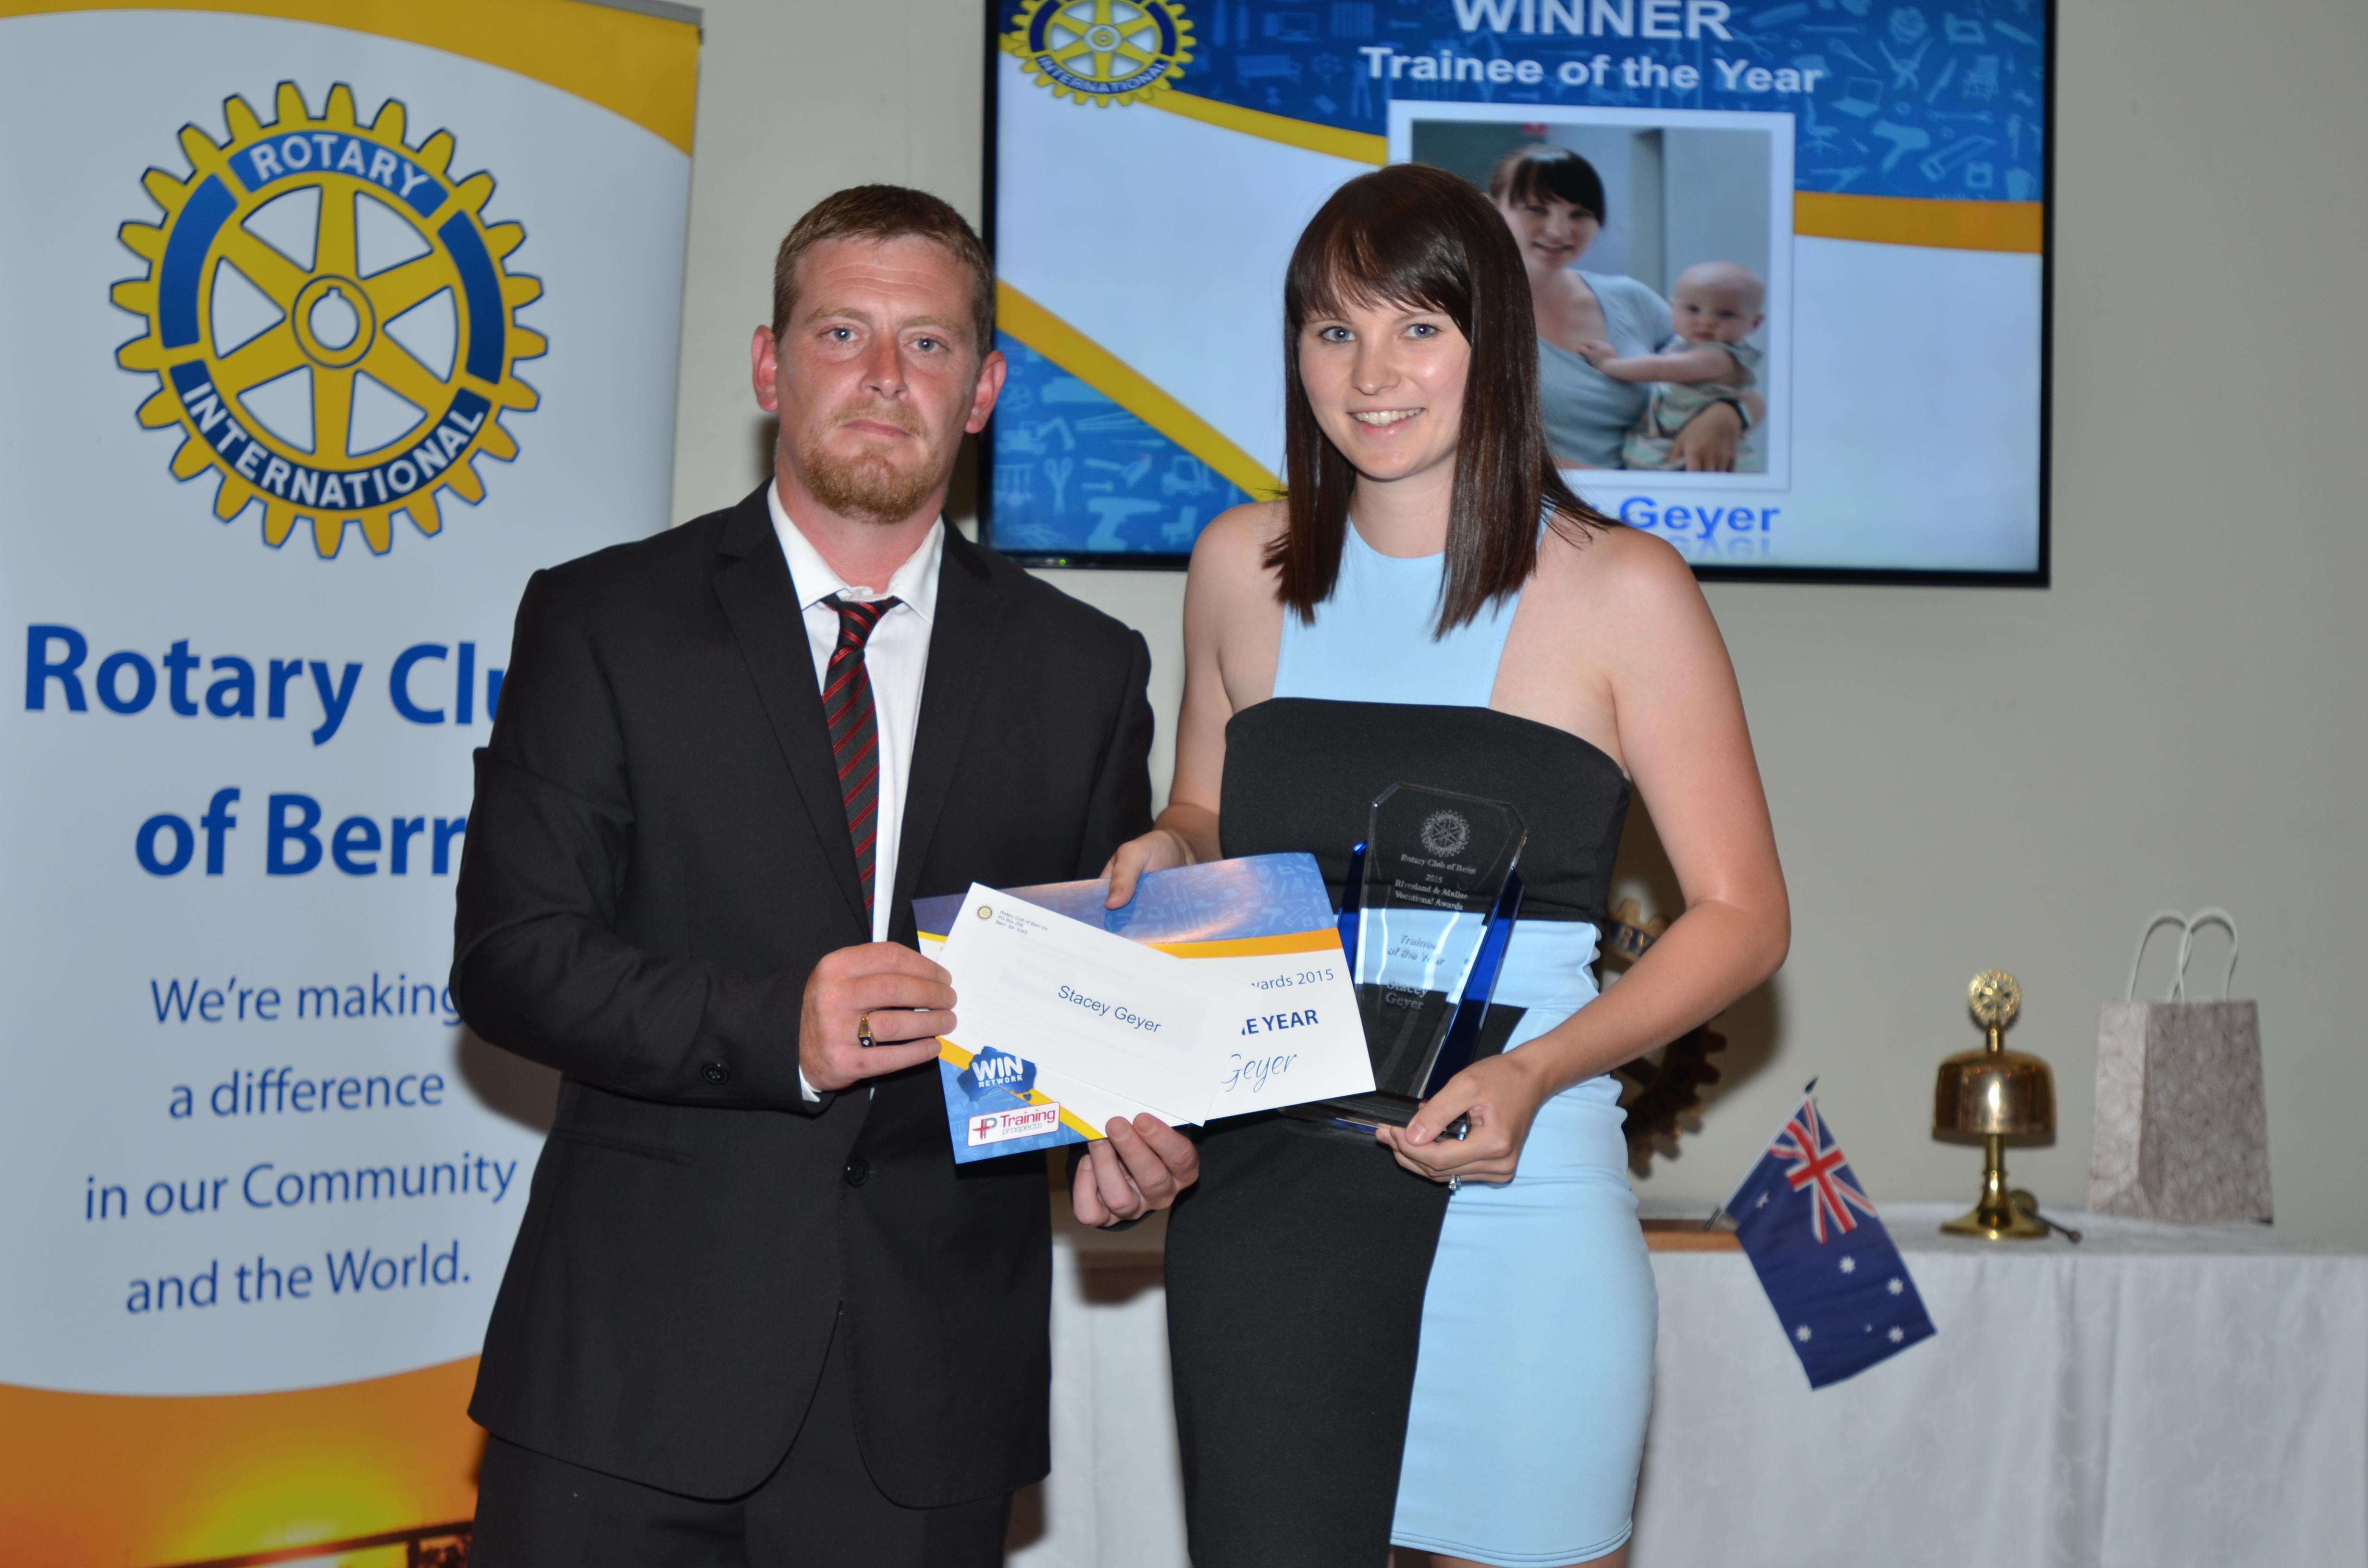 090216apprentice_trainee_awards_WSP_2528